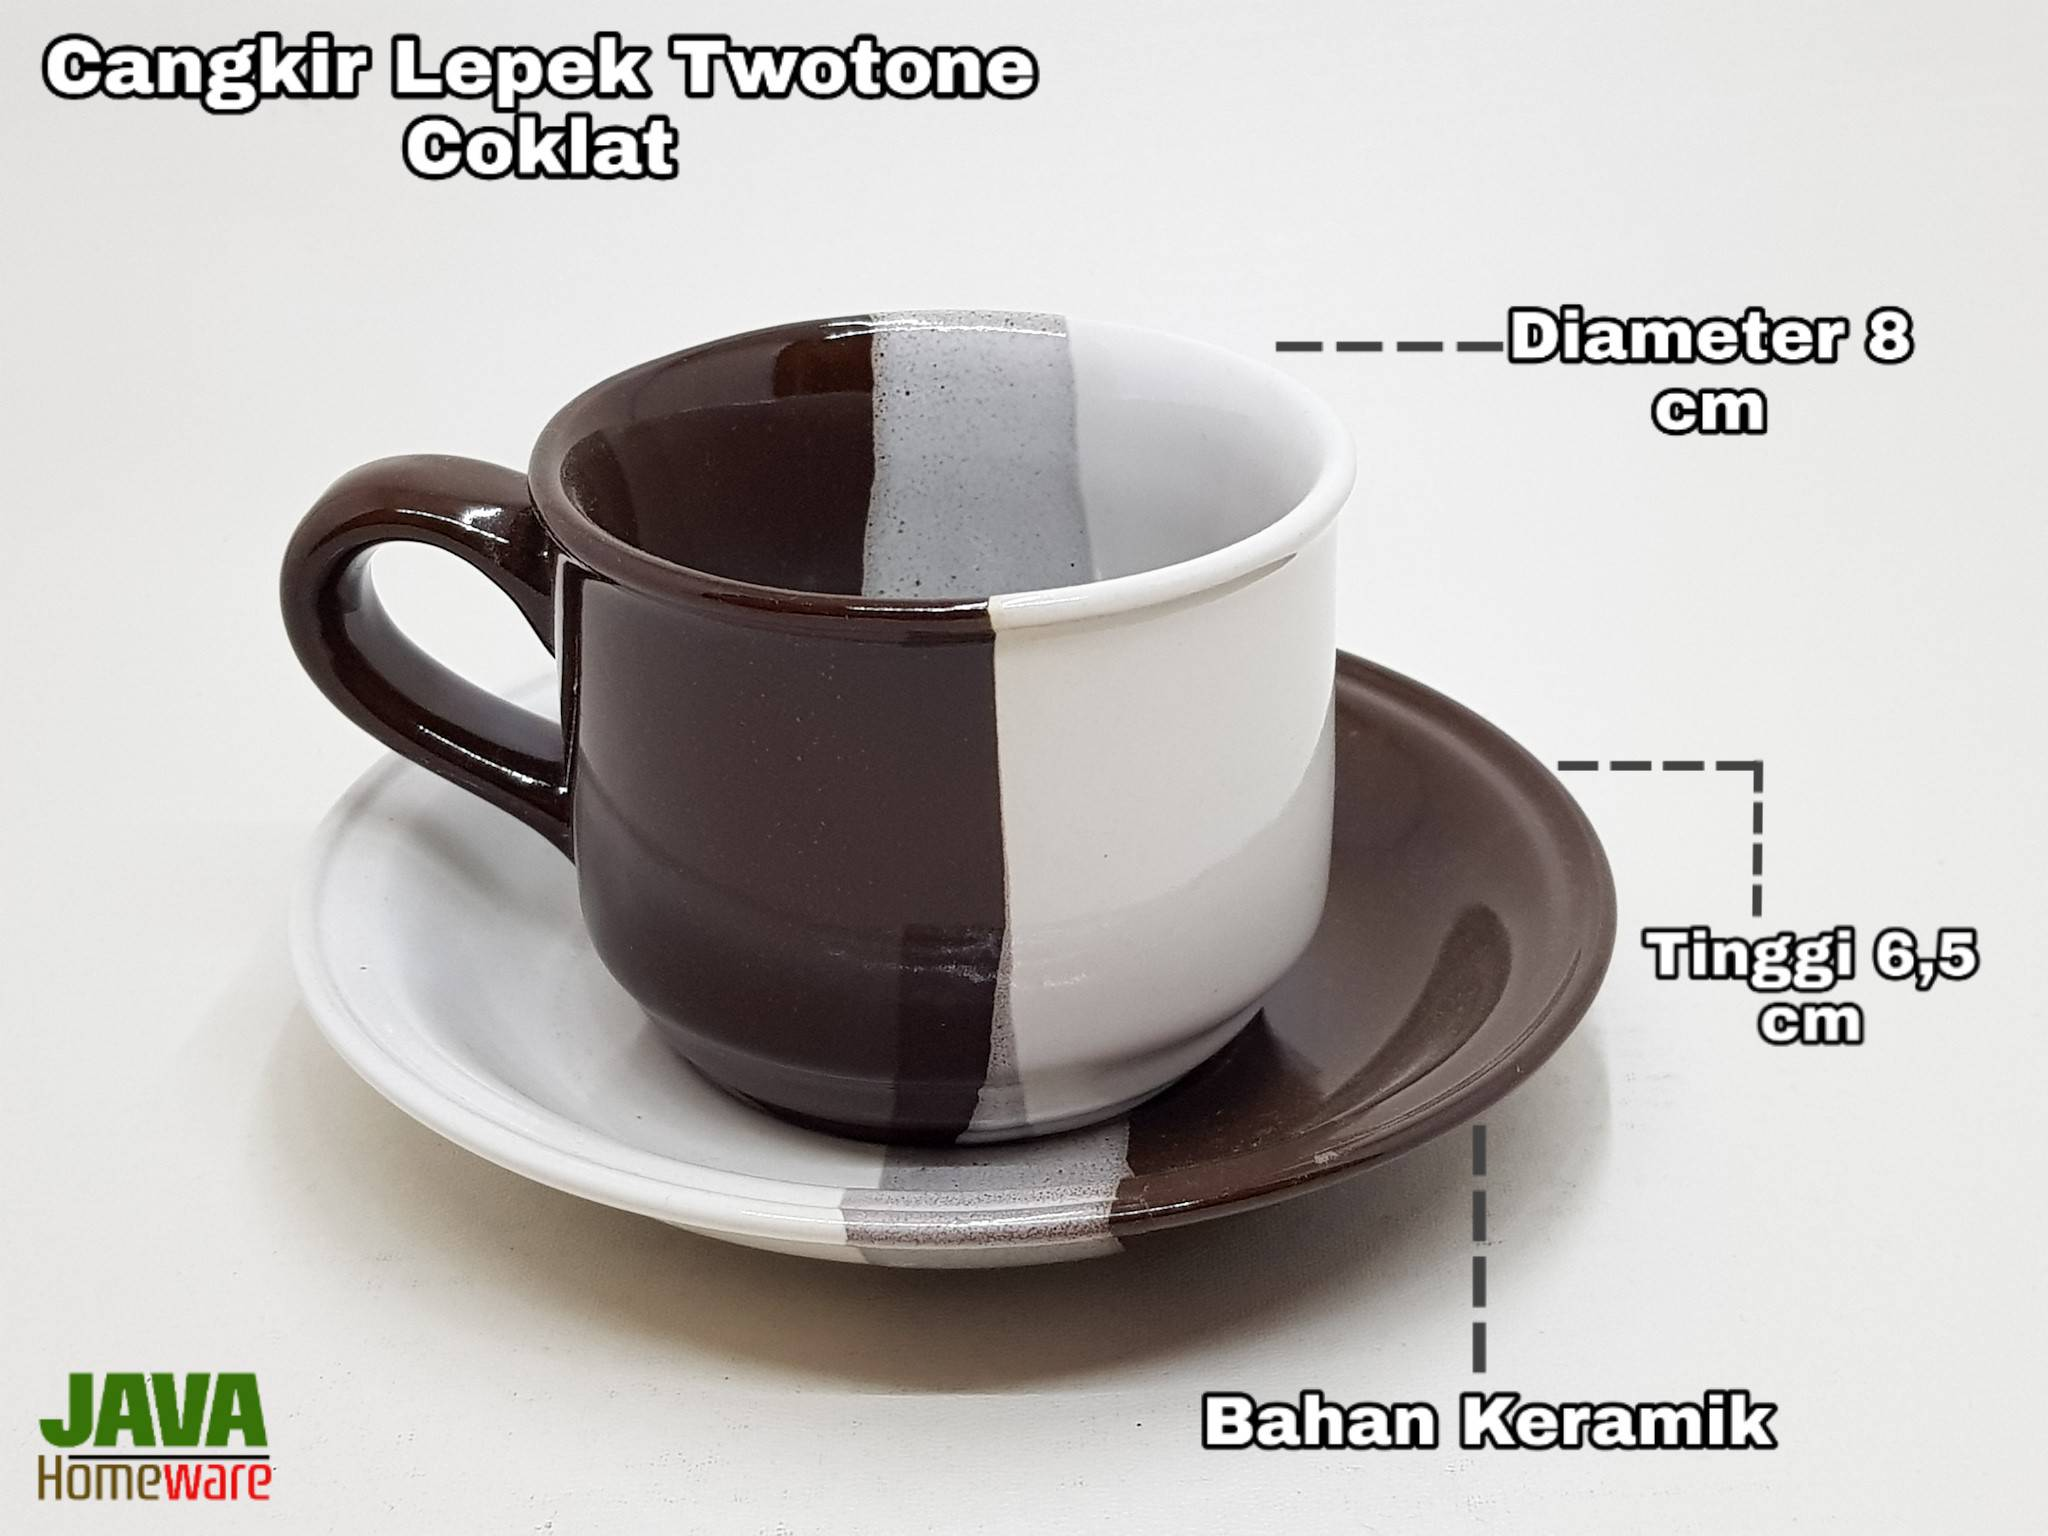 Cangkir Lepek Two tone Coklat